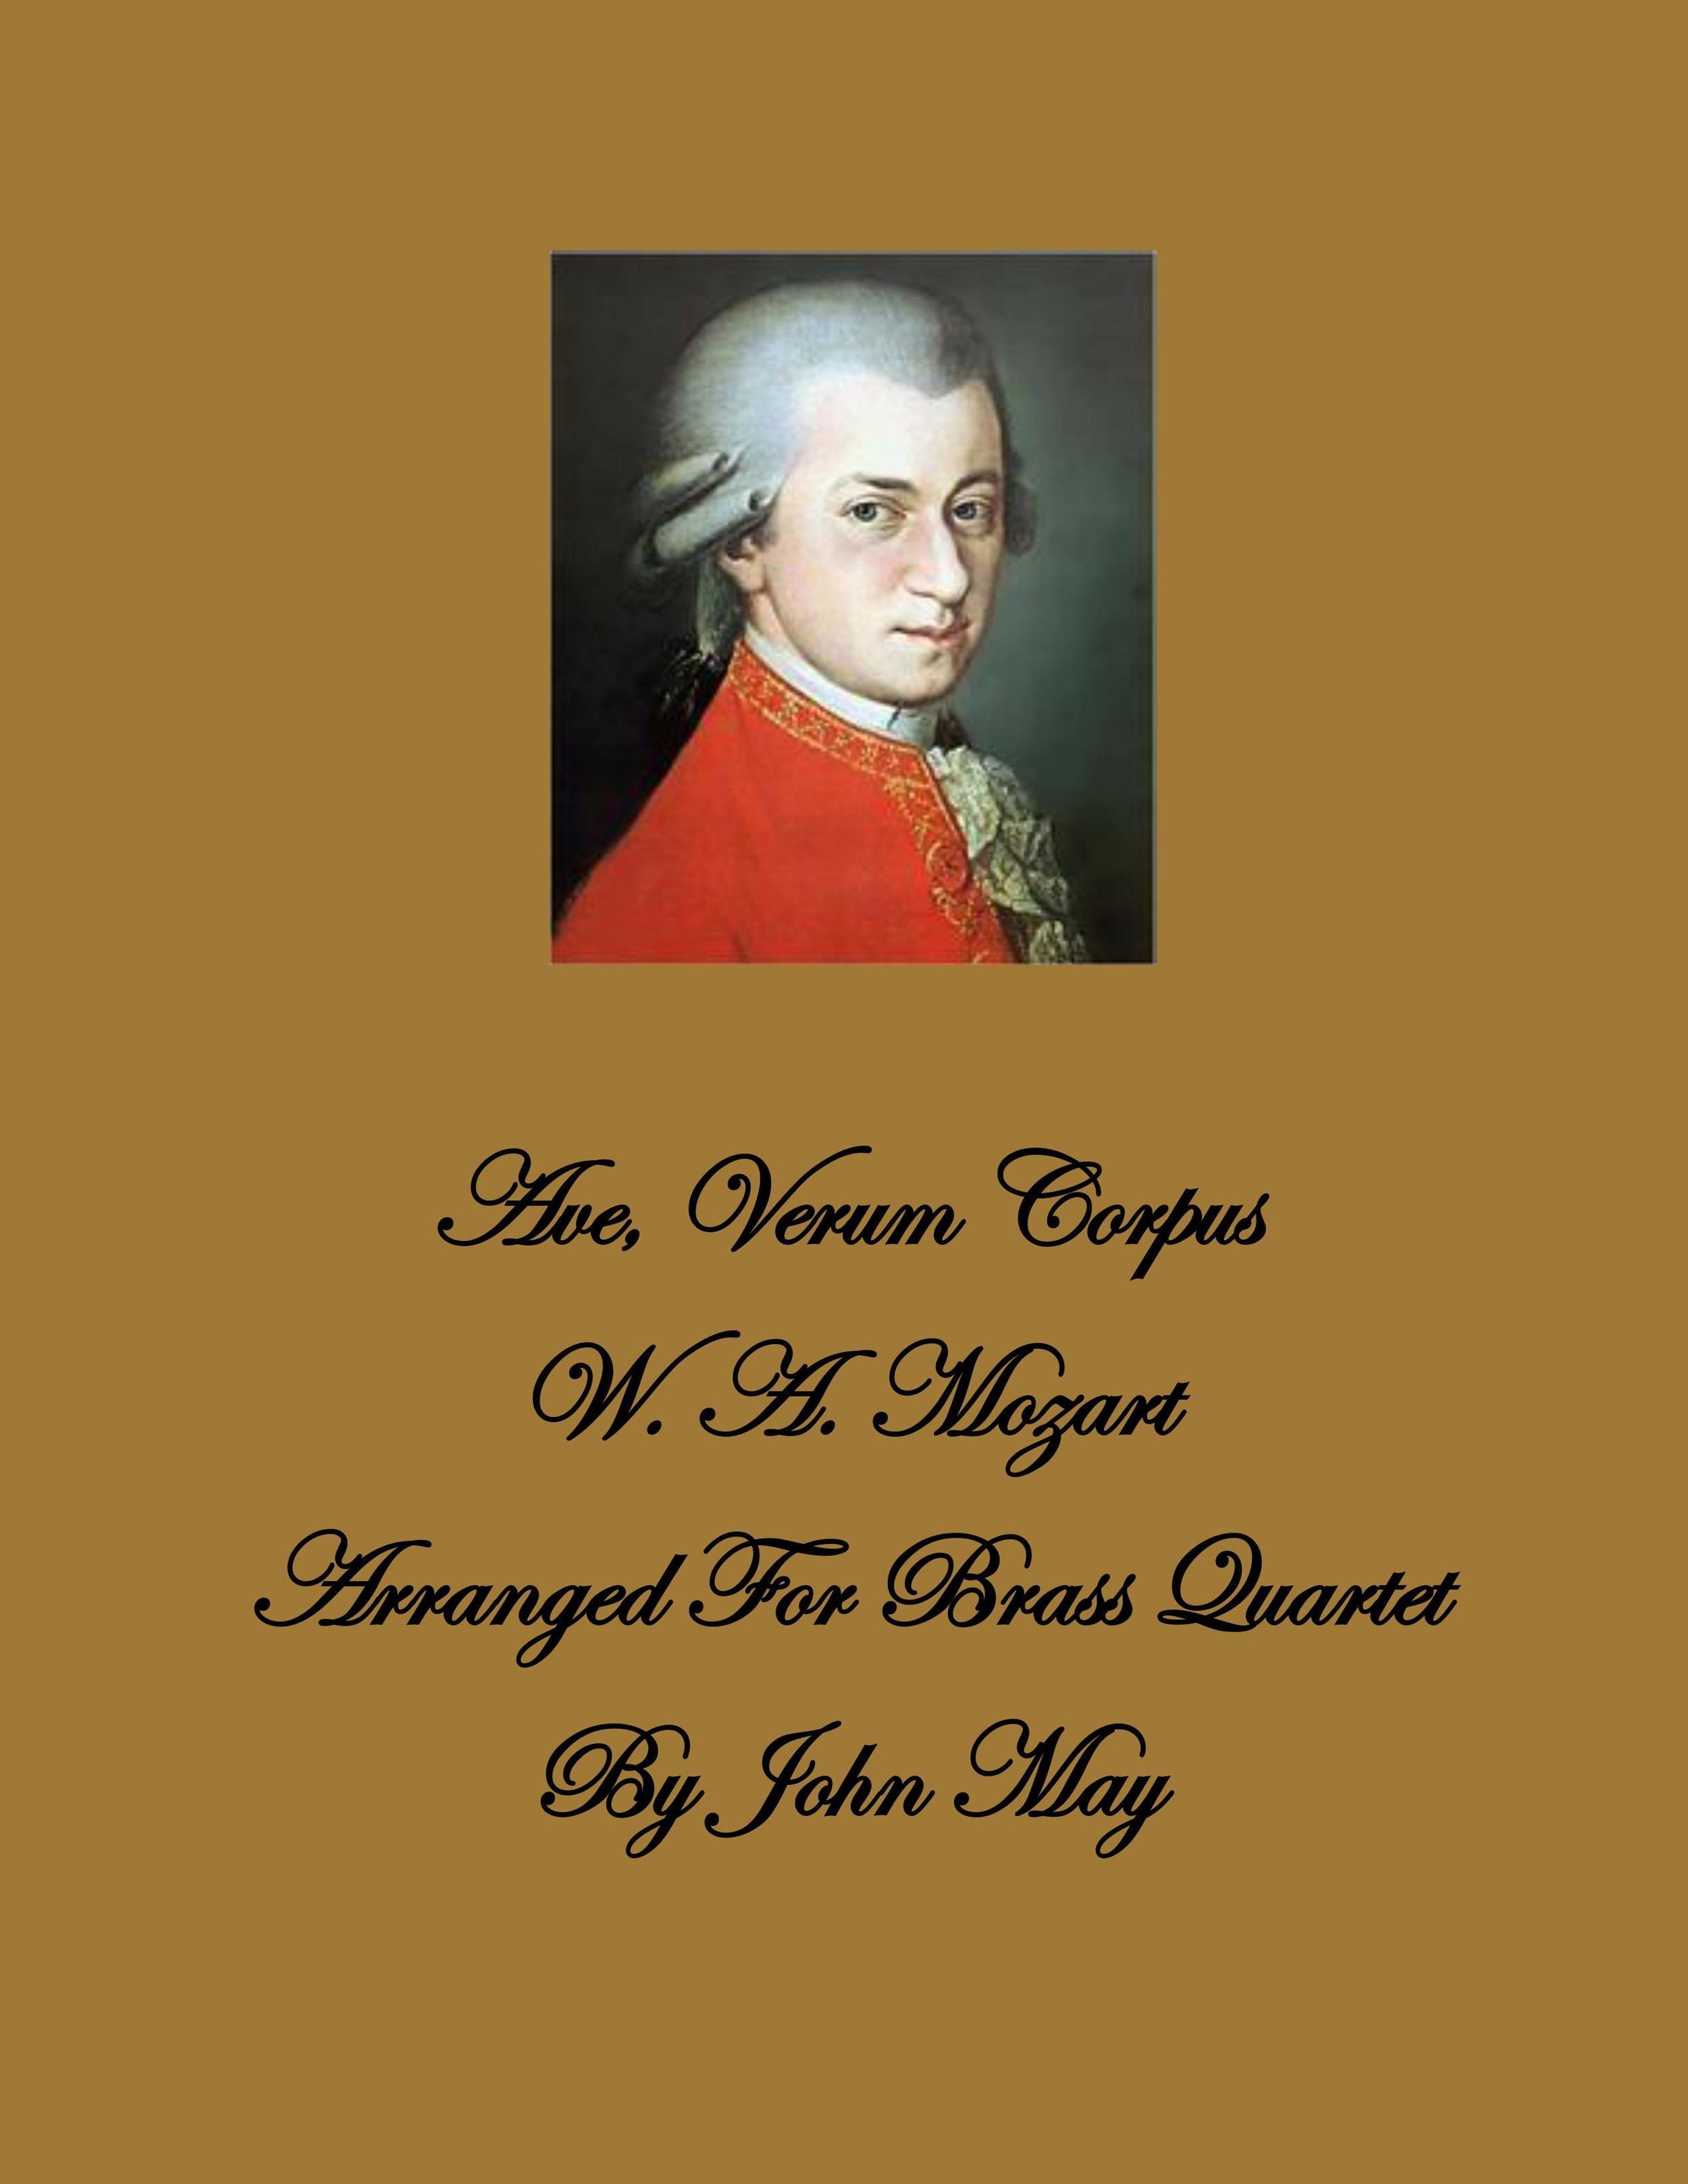 Ave Verum Corpus-Brass Quartet-Cover Photo.jpg